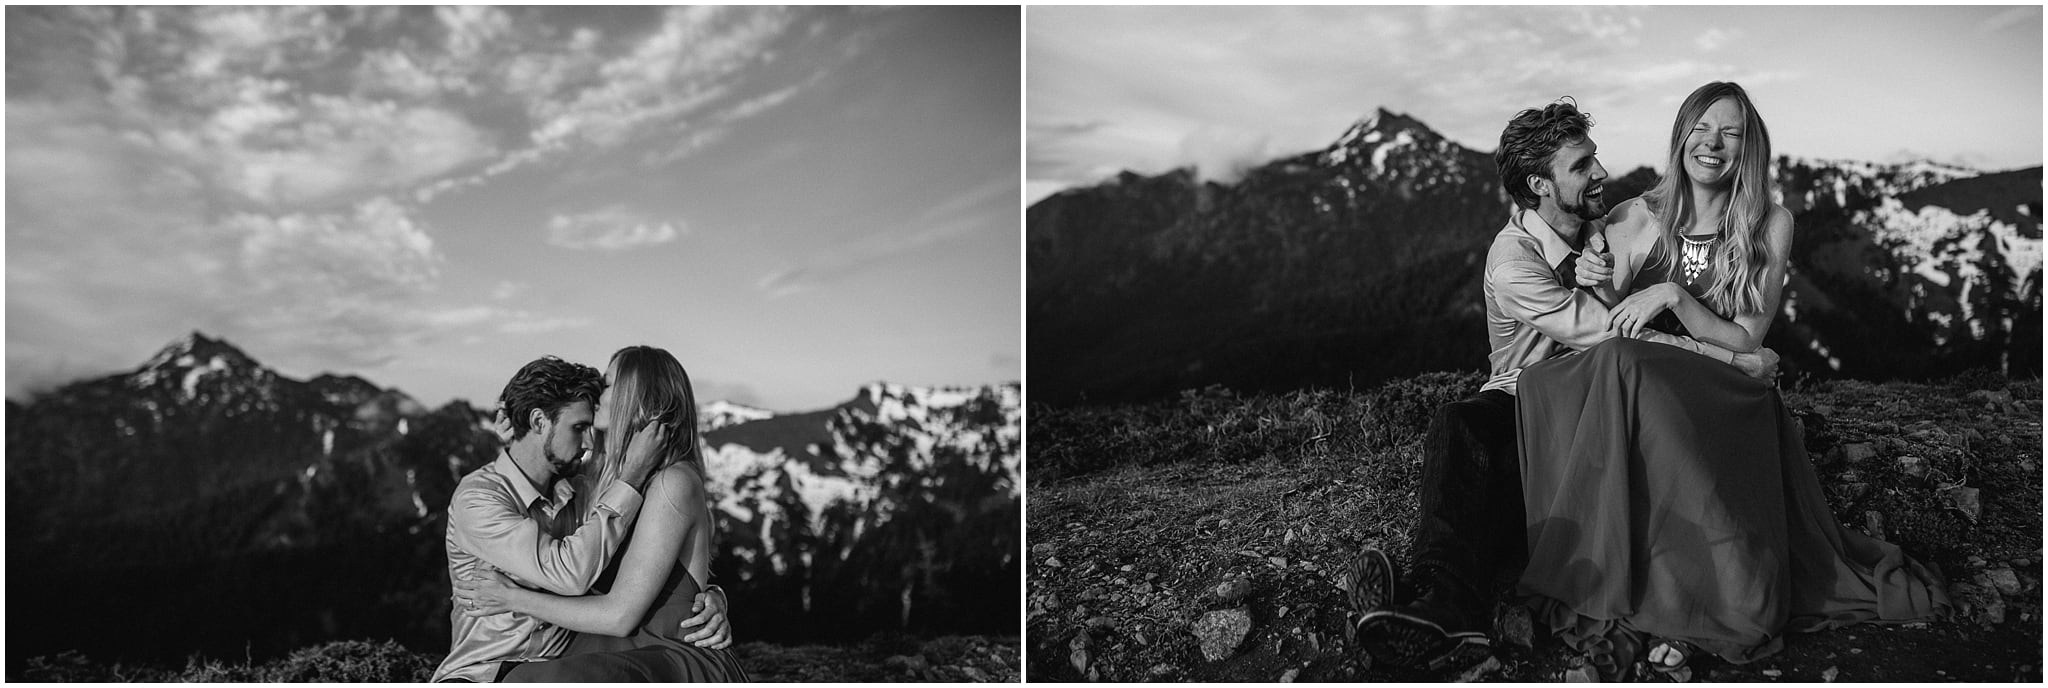 hurricane ridge, olympic national park, engagement, kim butler